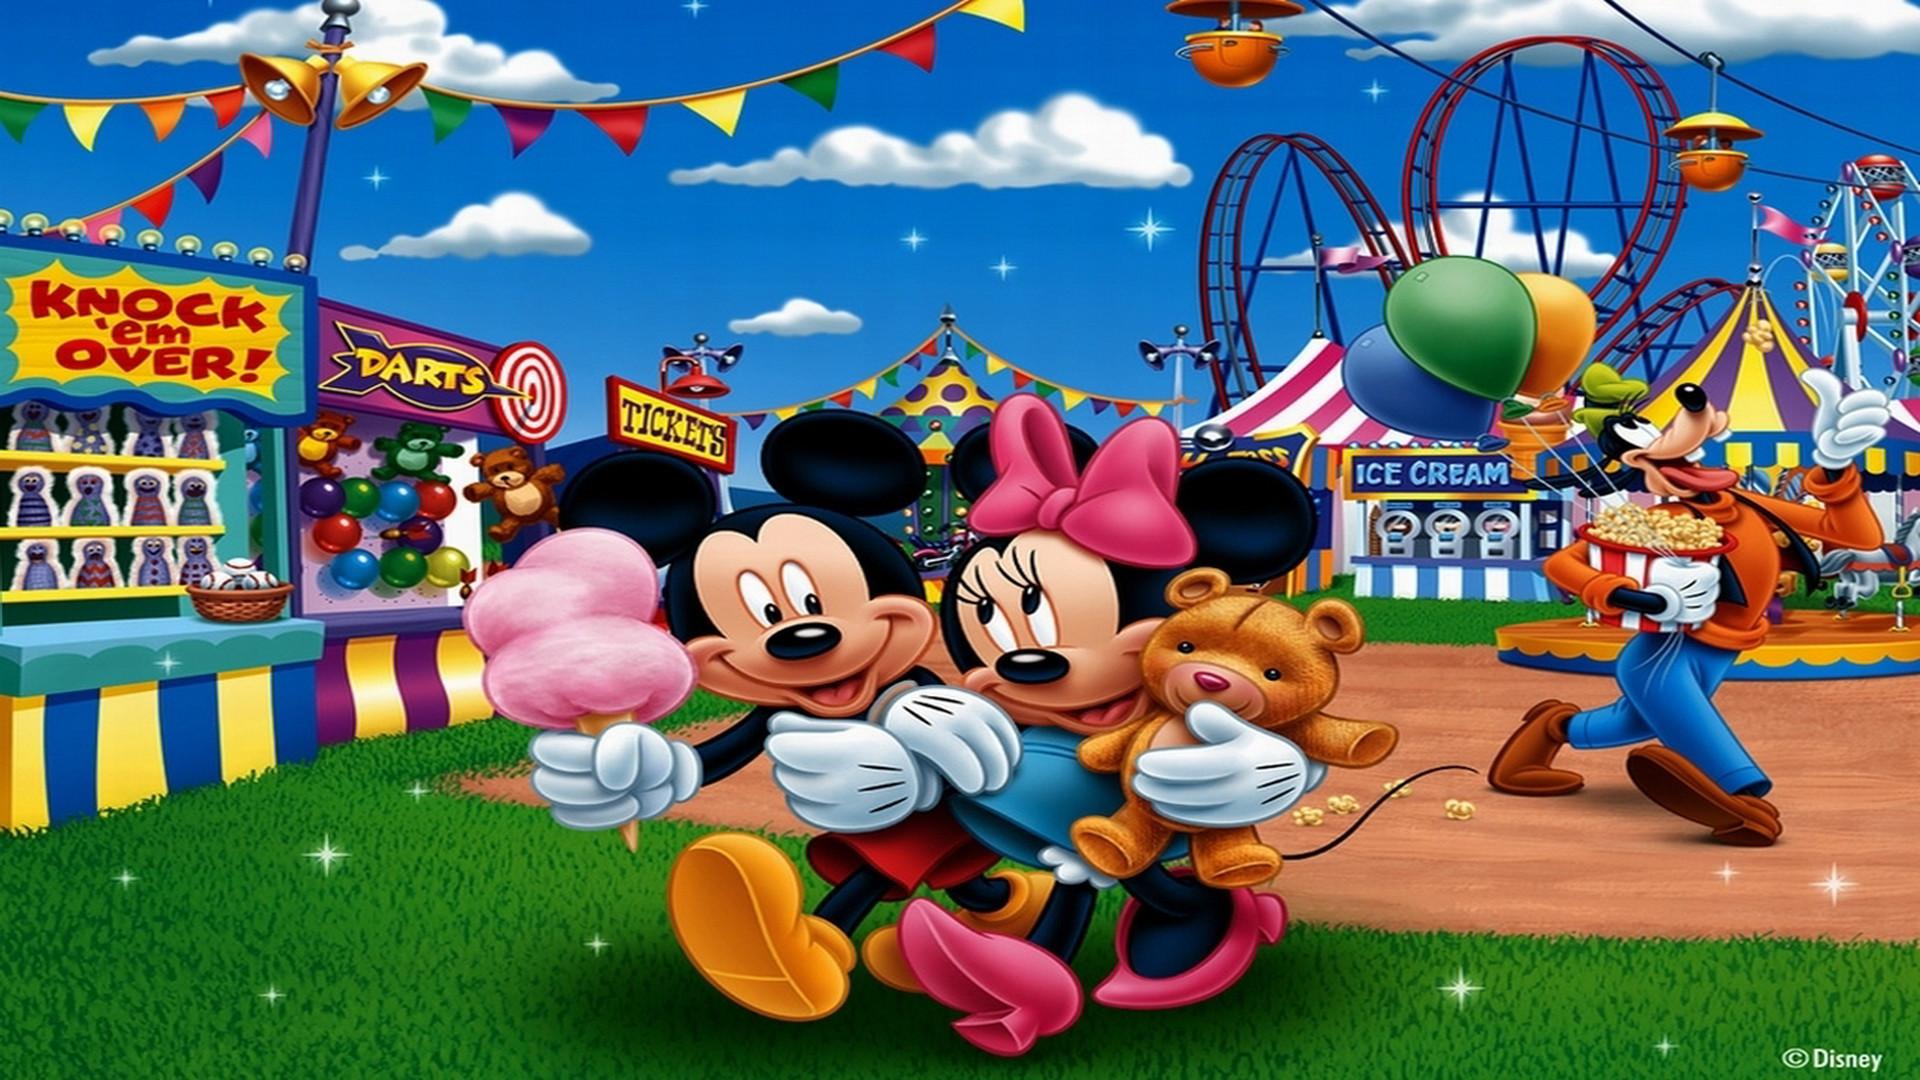 Disney hd wallpaper 74 images - Disney tablet wallpaper ...